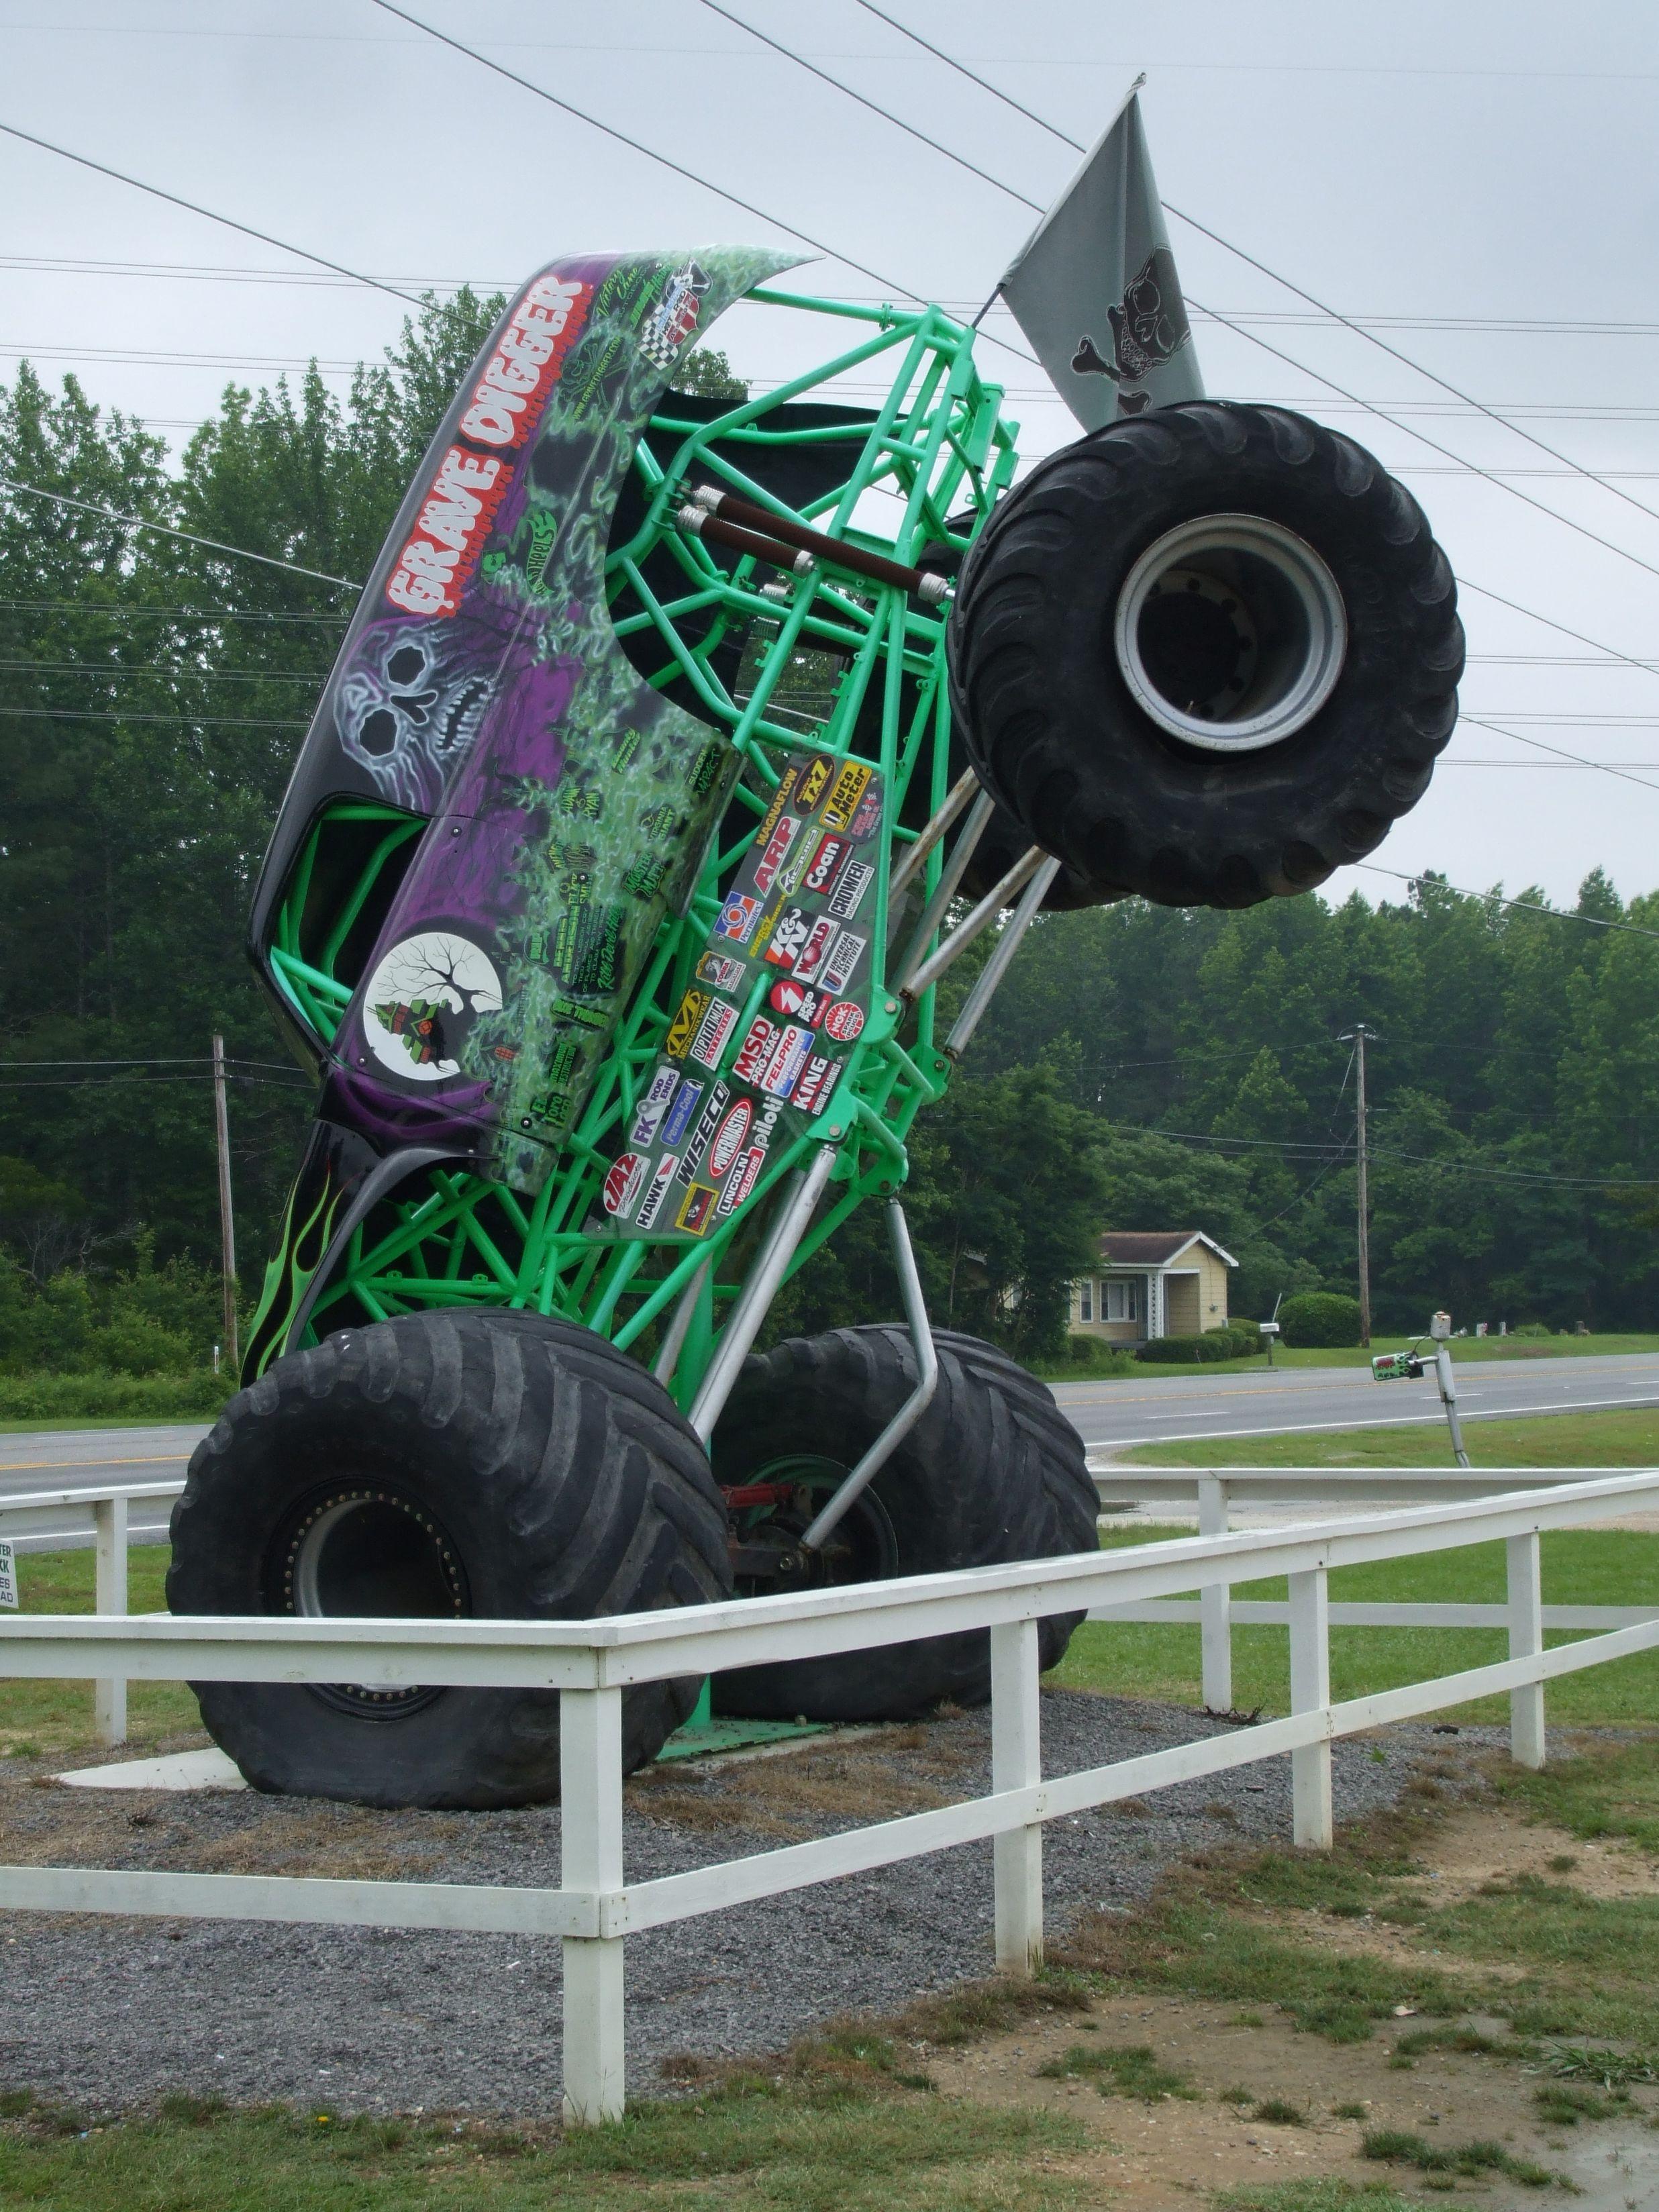 Grave Digger Monster truck